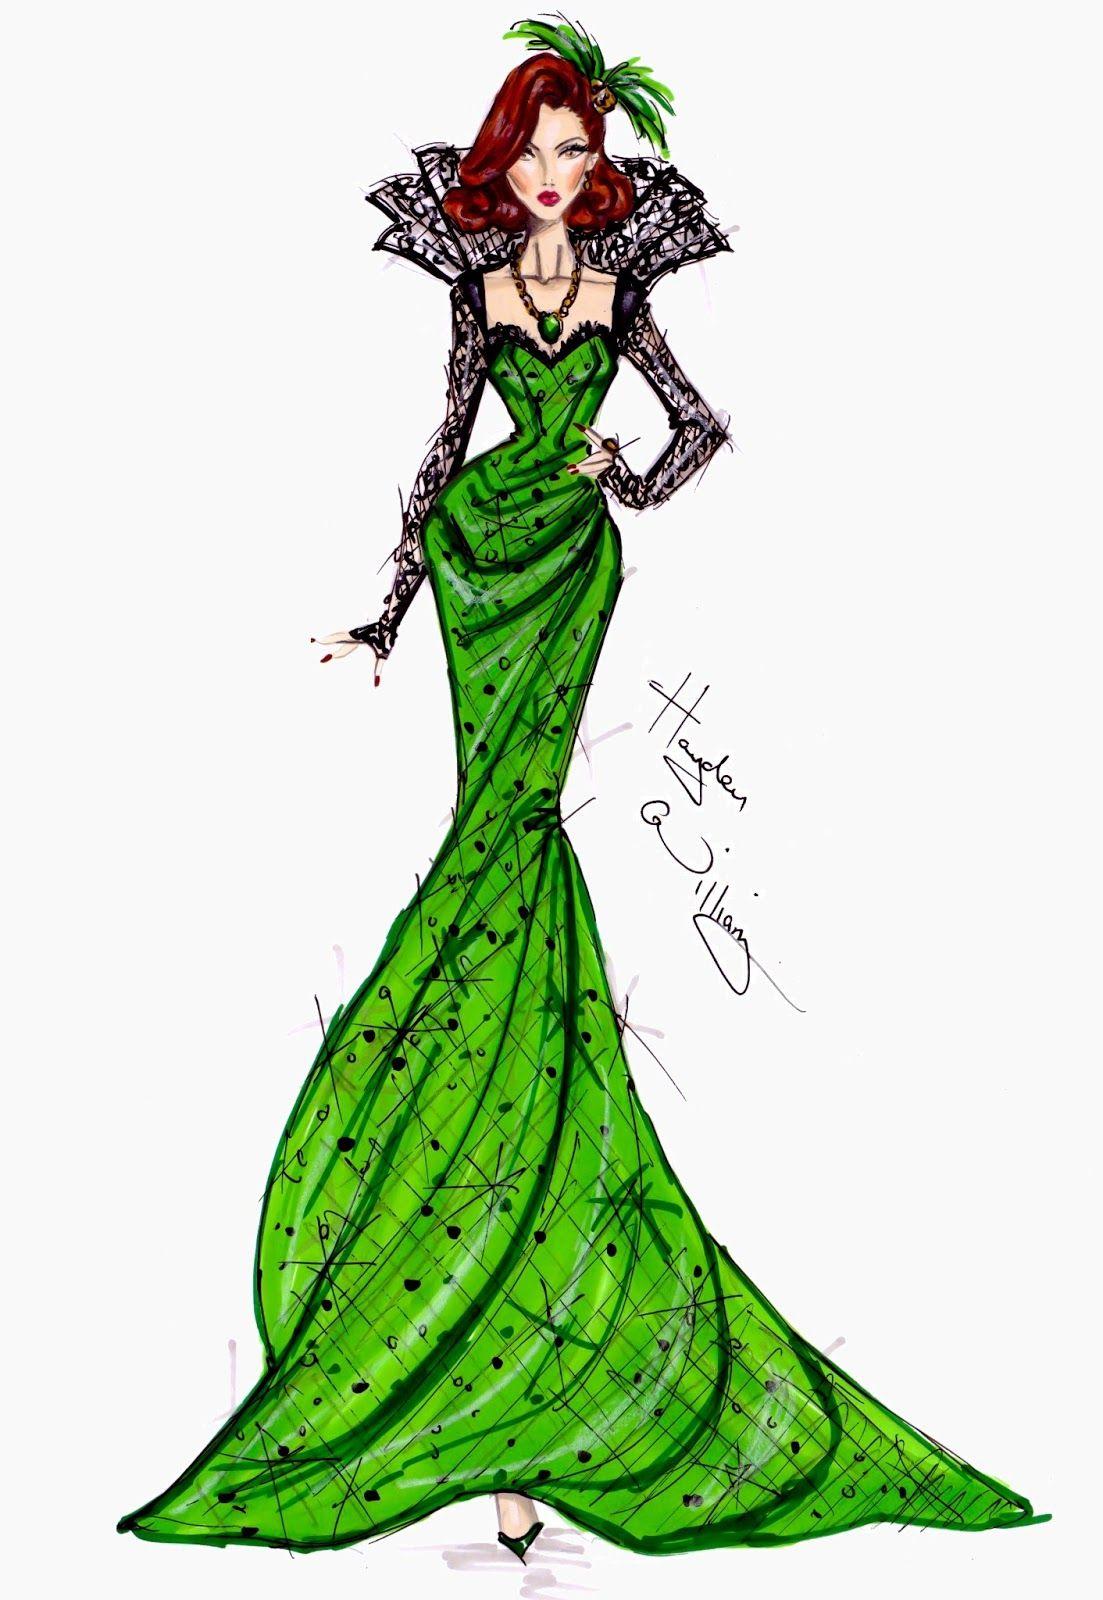 #Hayden Williams Fashion Illustrations    #Disney's 'Oz' by Hayden Williams - Evanora